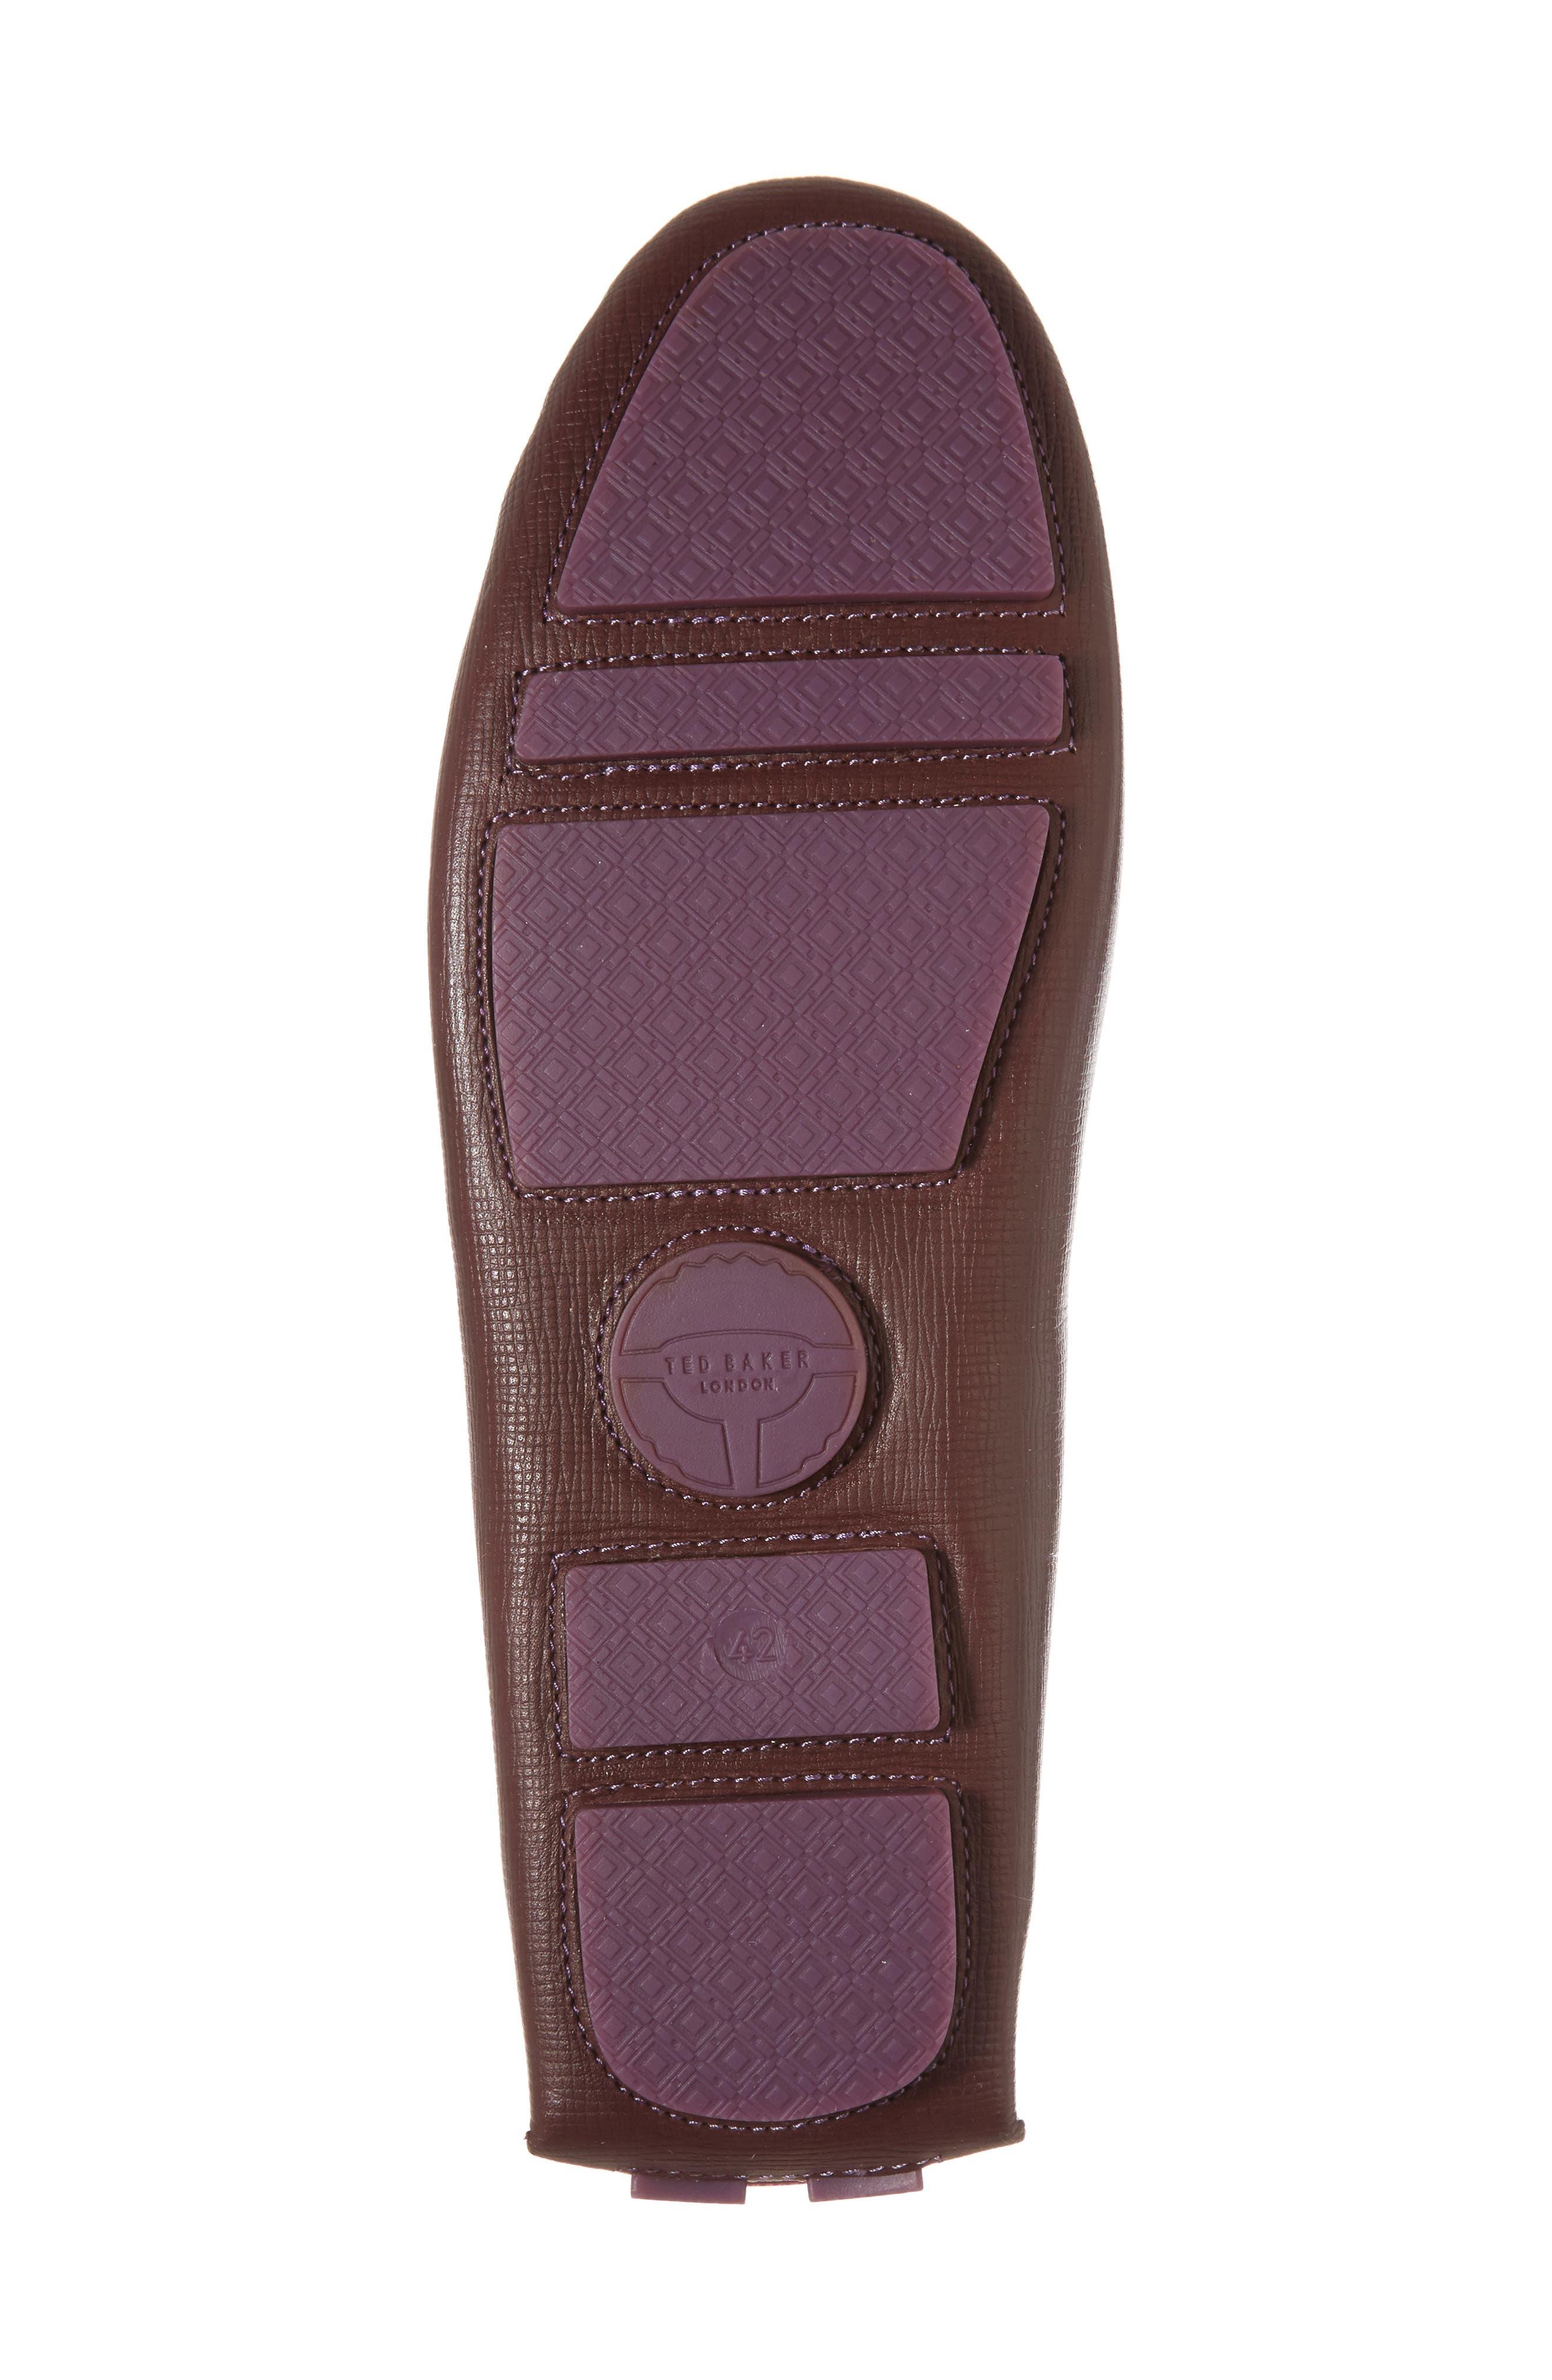 Urbonn Tasseled Driving Loafer,                             Alternate thumbnail 6, color,                             Dark Red Leather